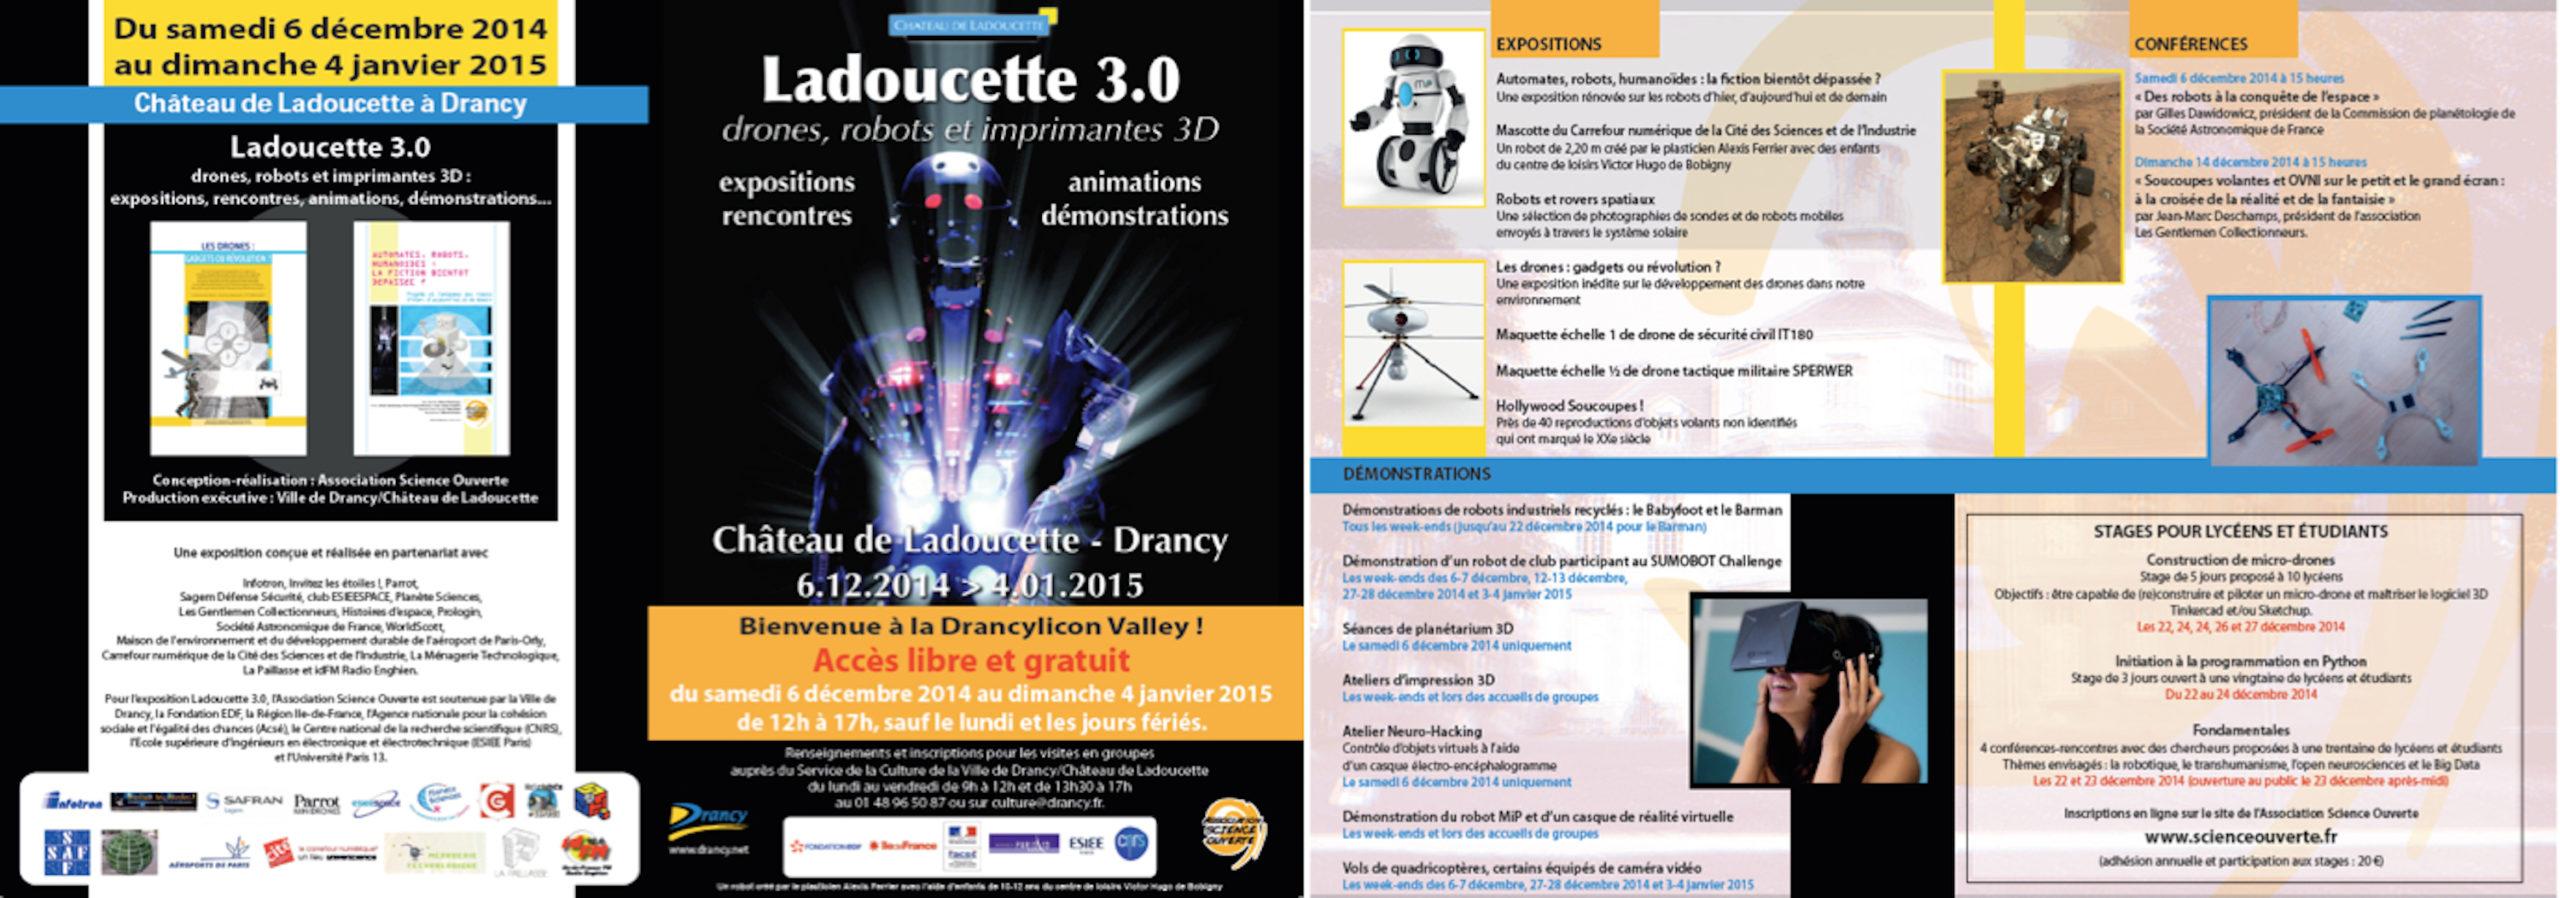 ladoucette_3.0_grand.jpg